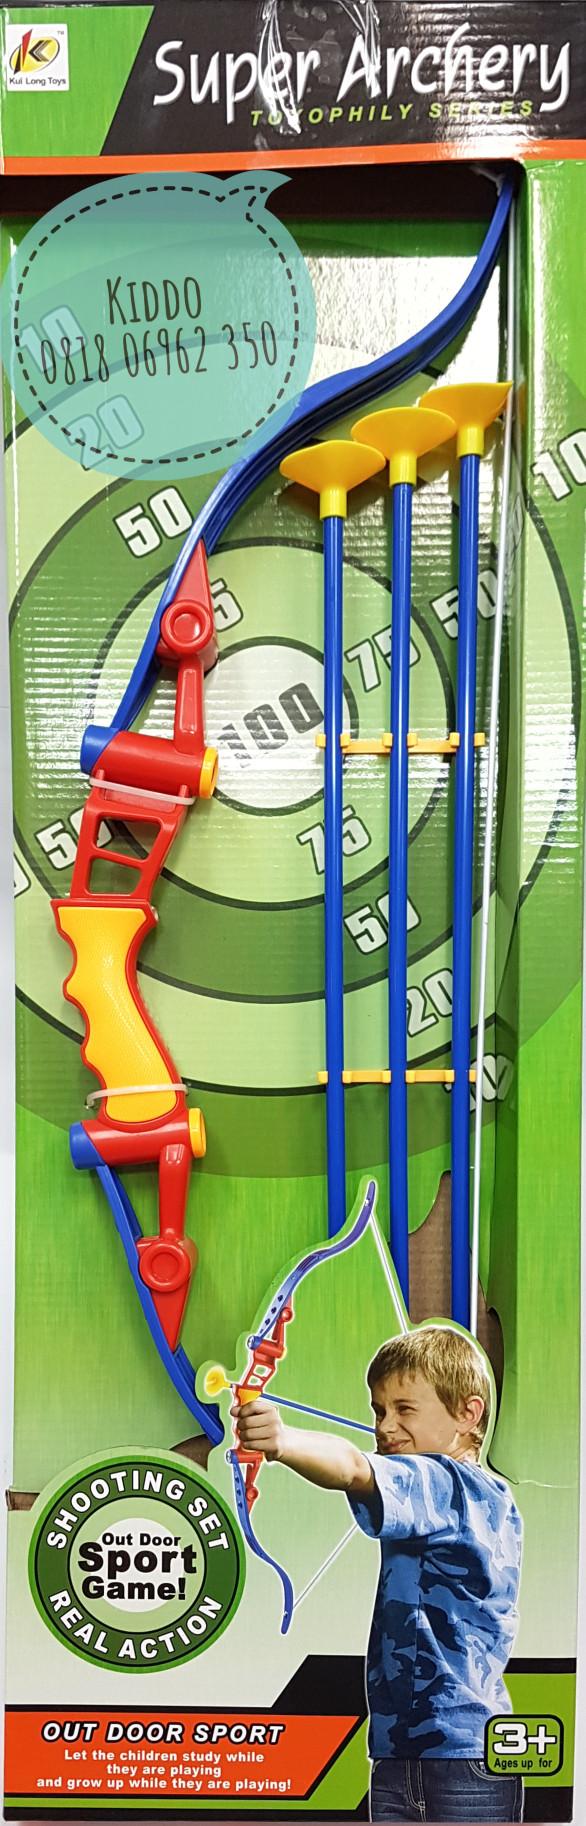 Lumi Toys Super Archery Mainan Panah Panahan Daftar Harga Anak Jual Nay Tokopedia Source Memanah 40